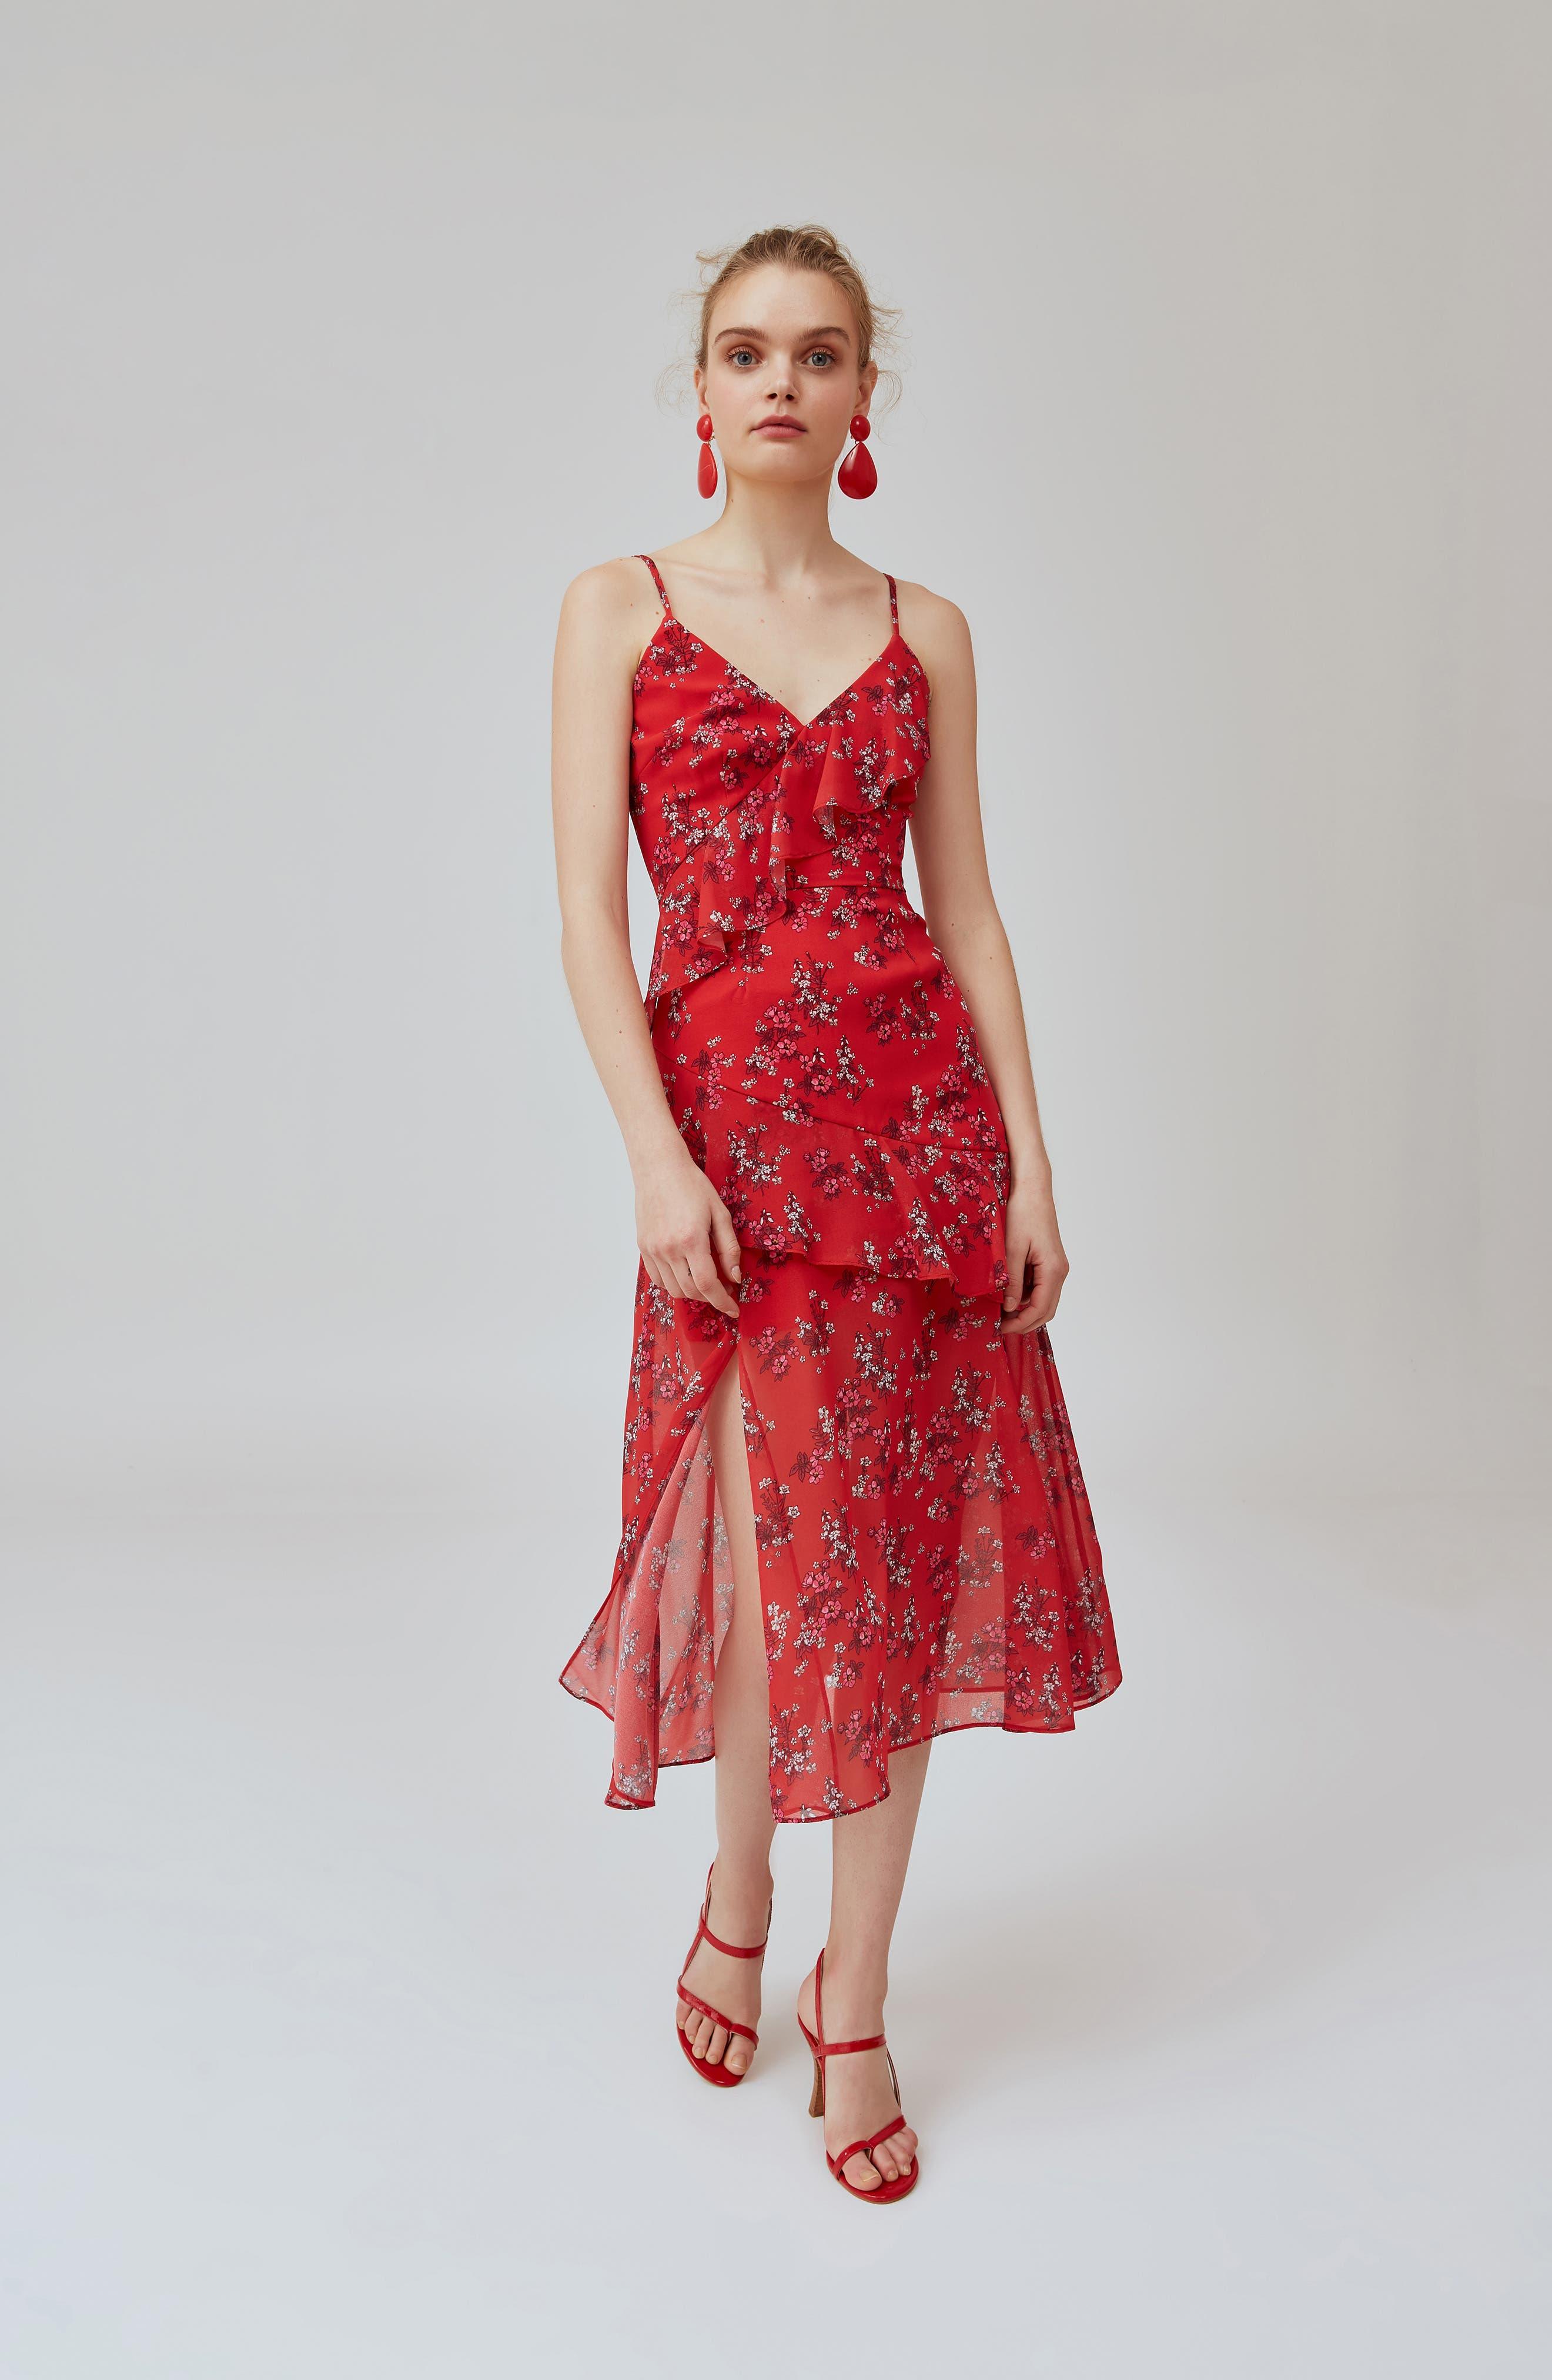 KEEPSAKE THE LABEL,                             Heart & Soul Ruffle Detail Tea Length Dress,                             Alternate thumbnail 8, color,                             SMALL RED FLORAL